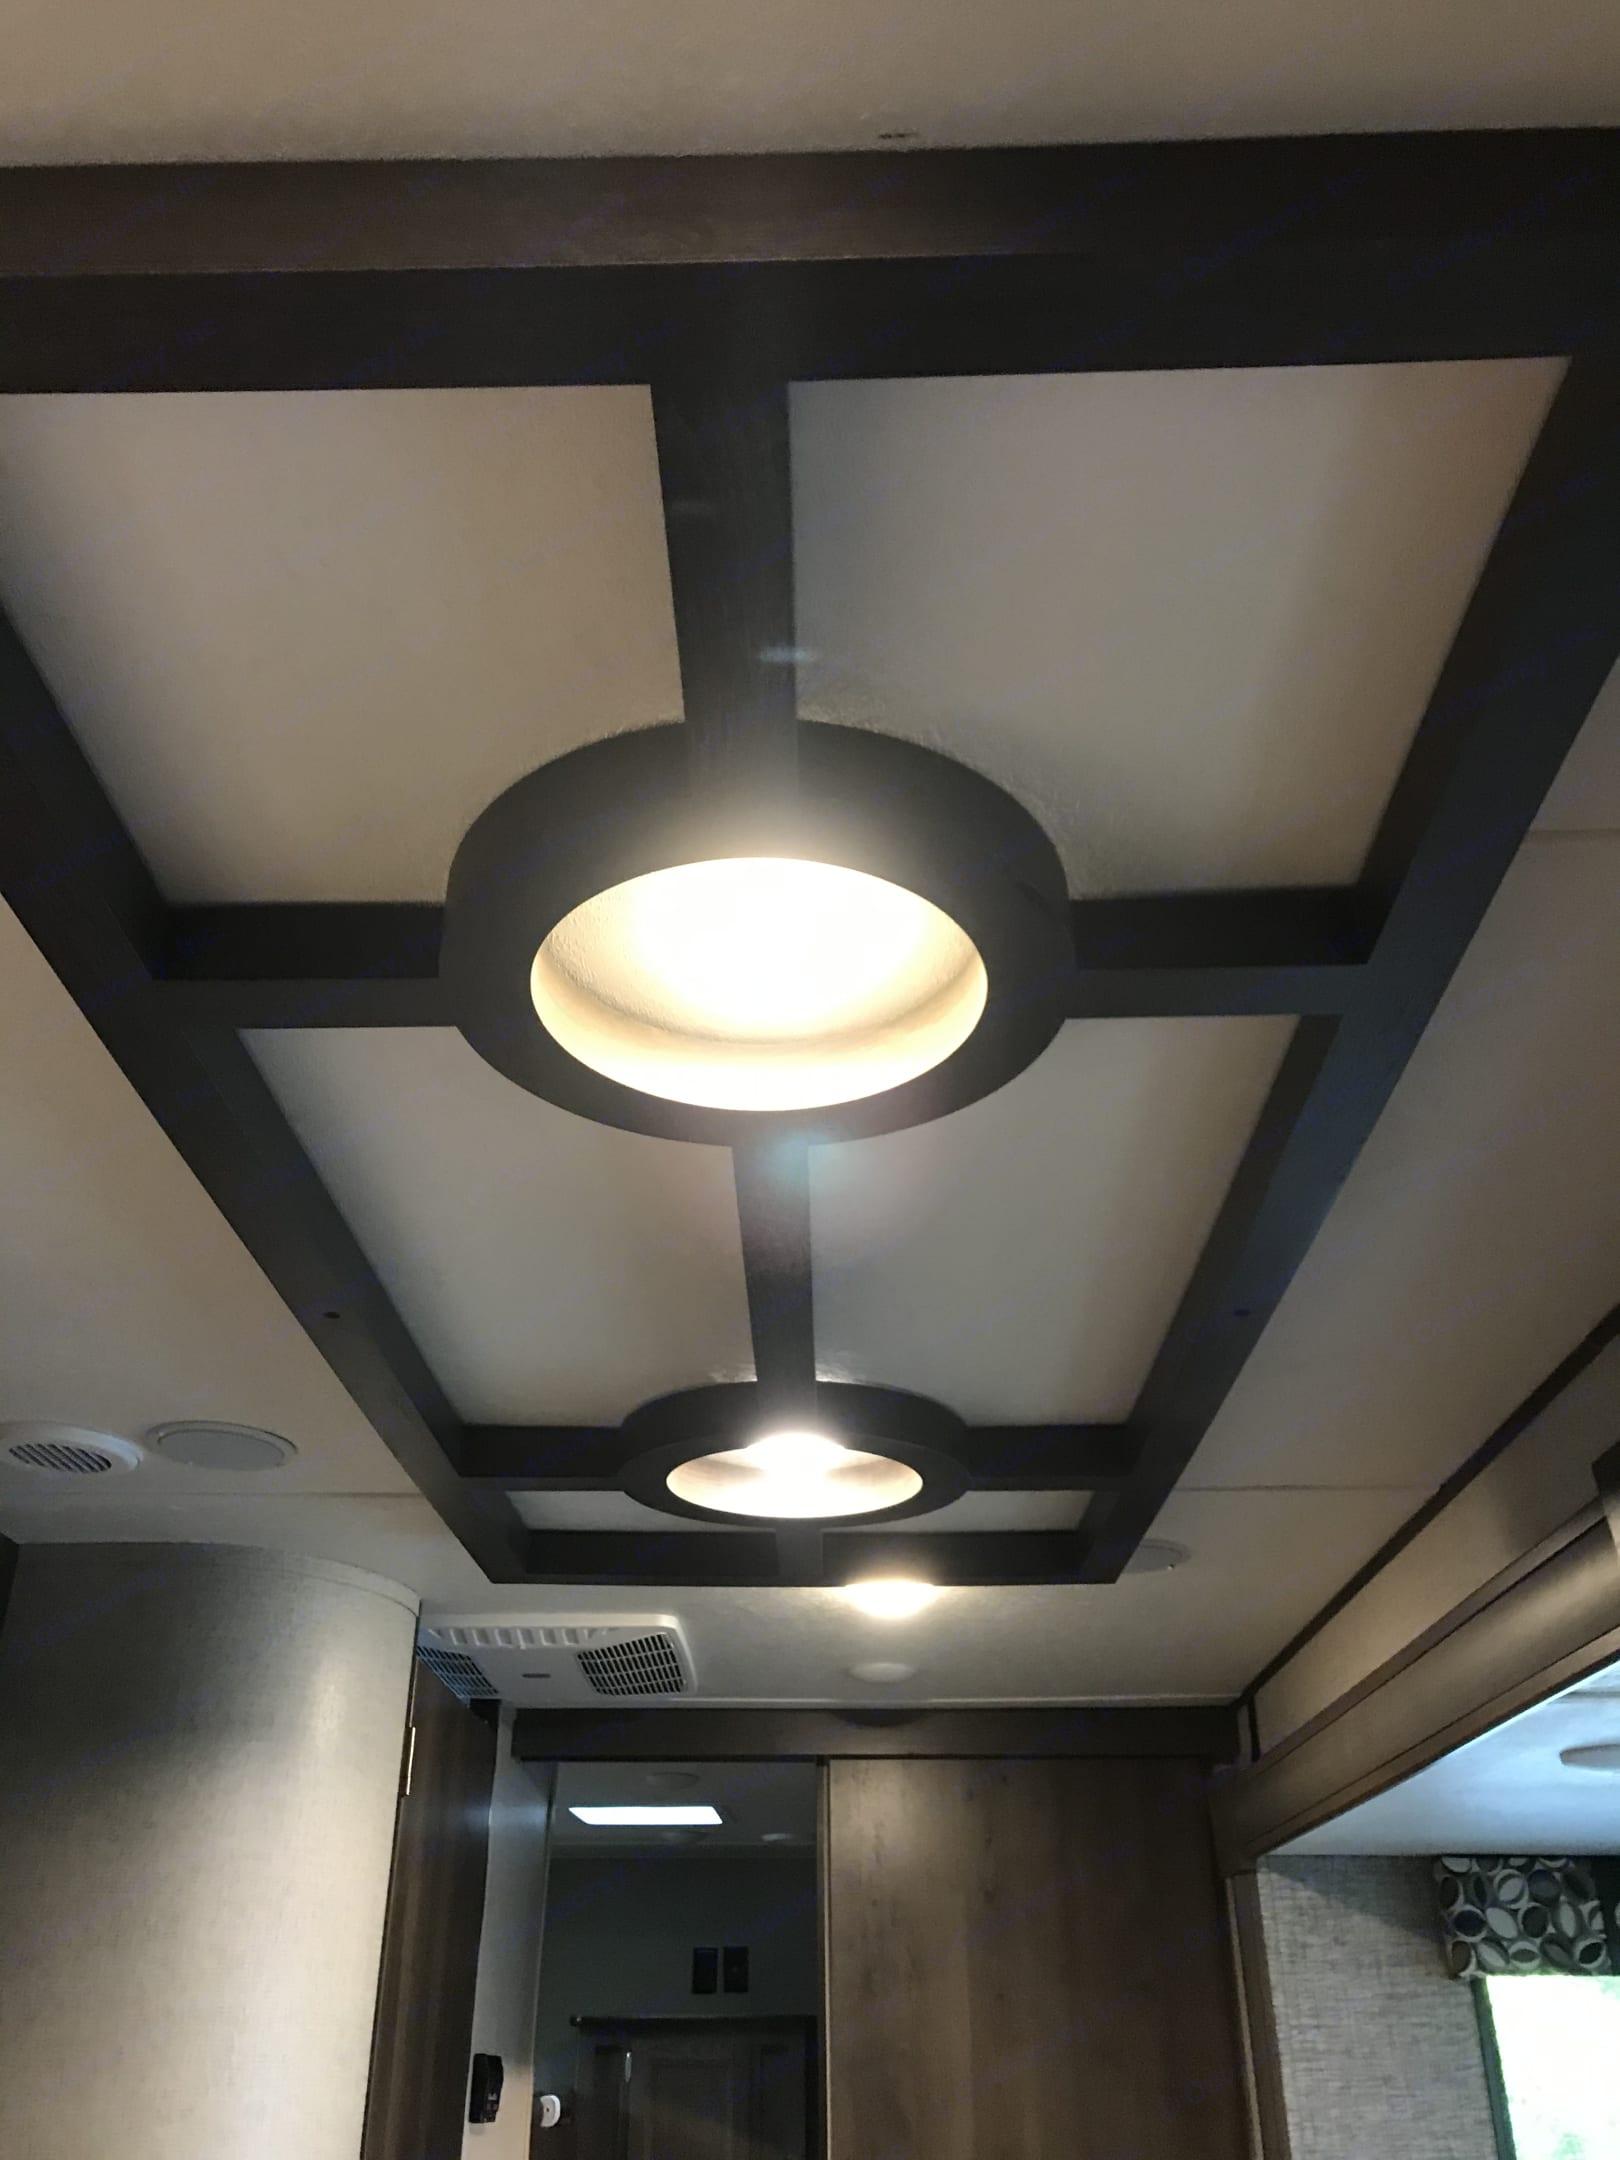 I need custom ceiling lighting that also changes to blue lights. Shasta Revere 2019